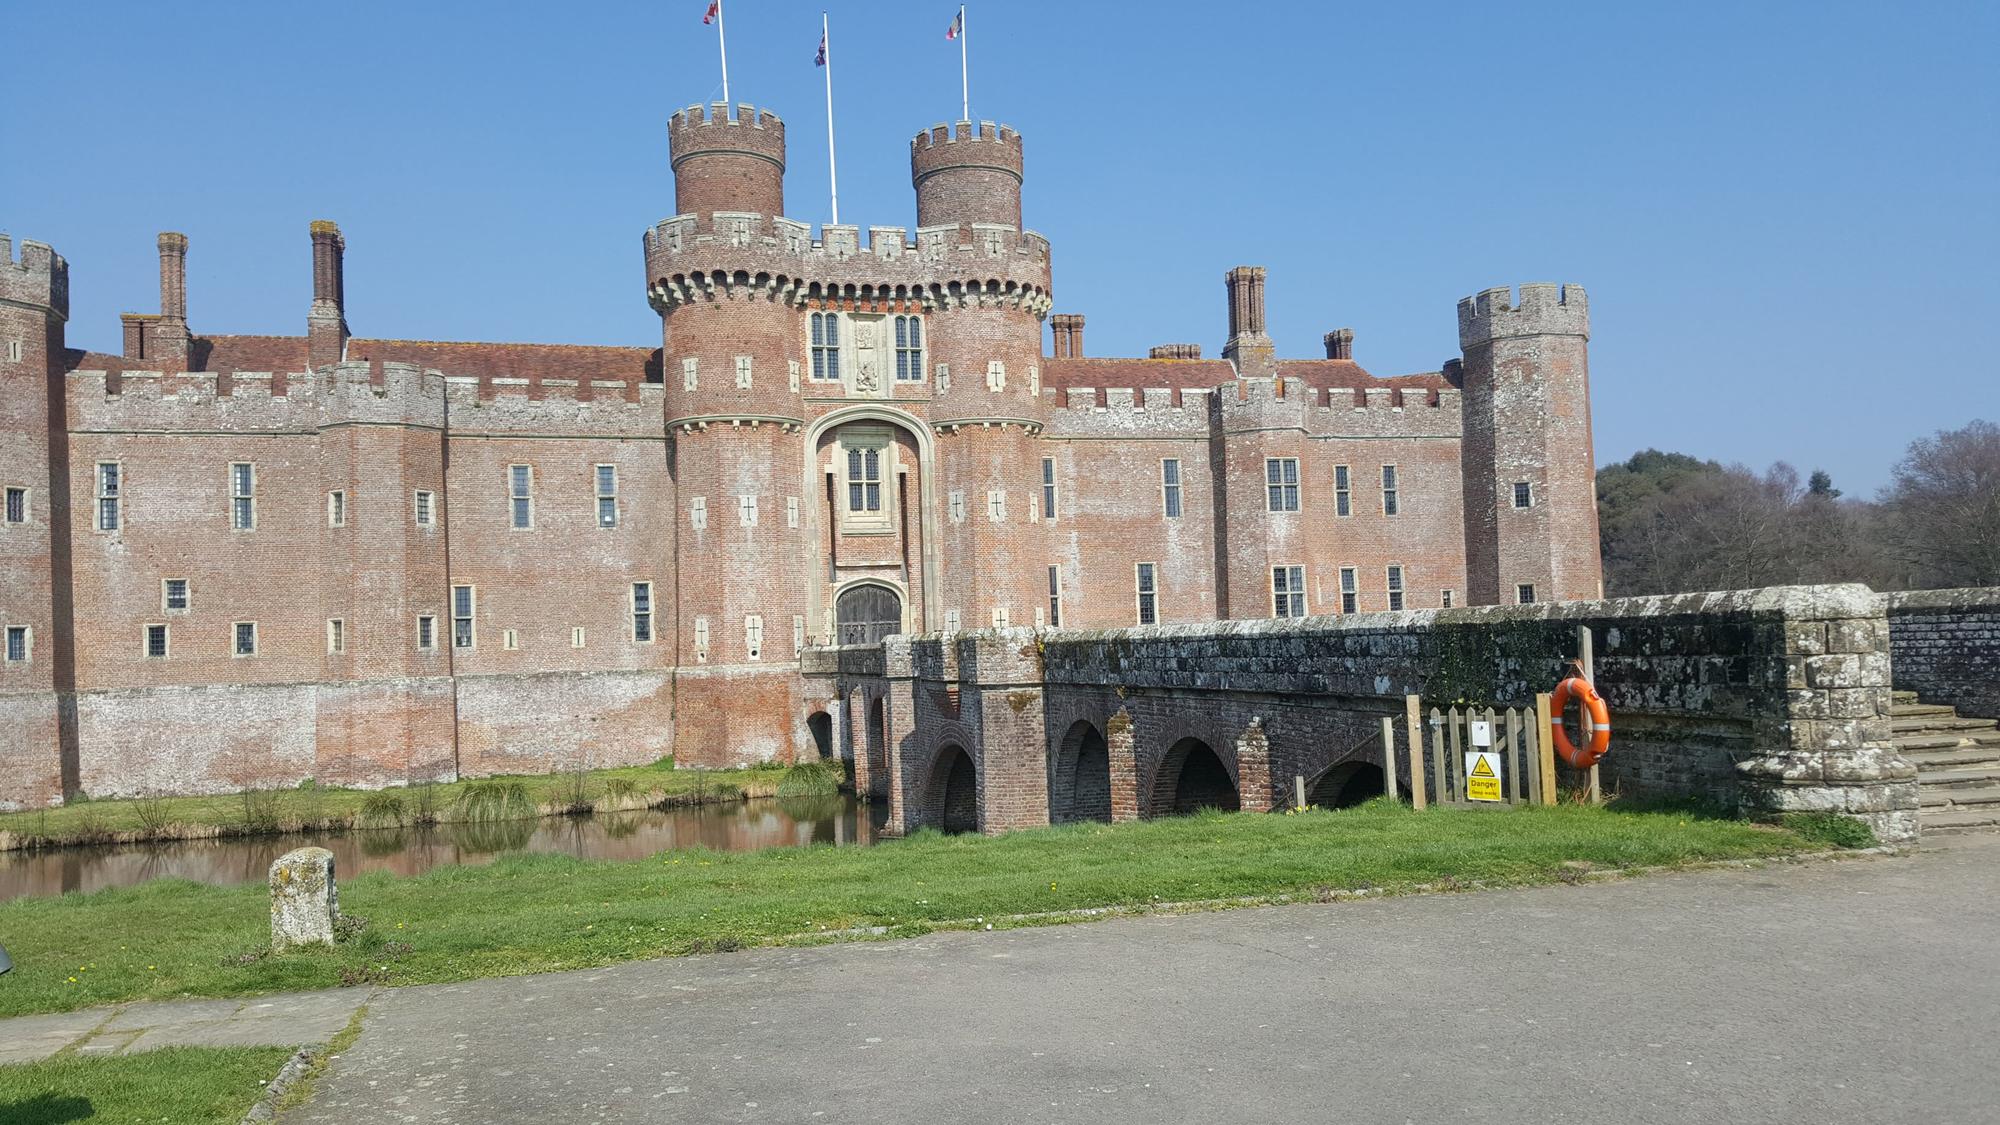 Herstmonceux Castle facade